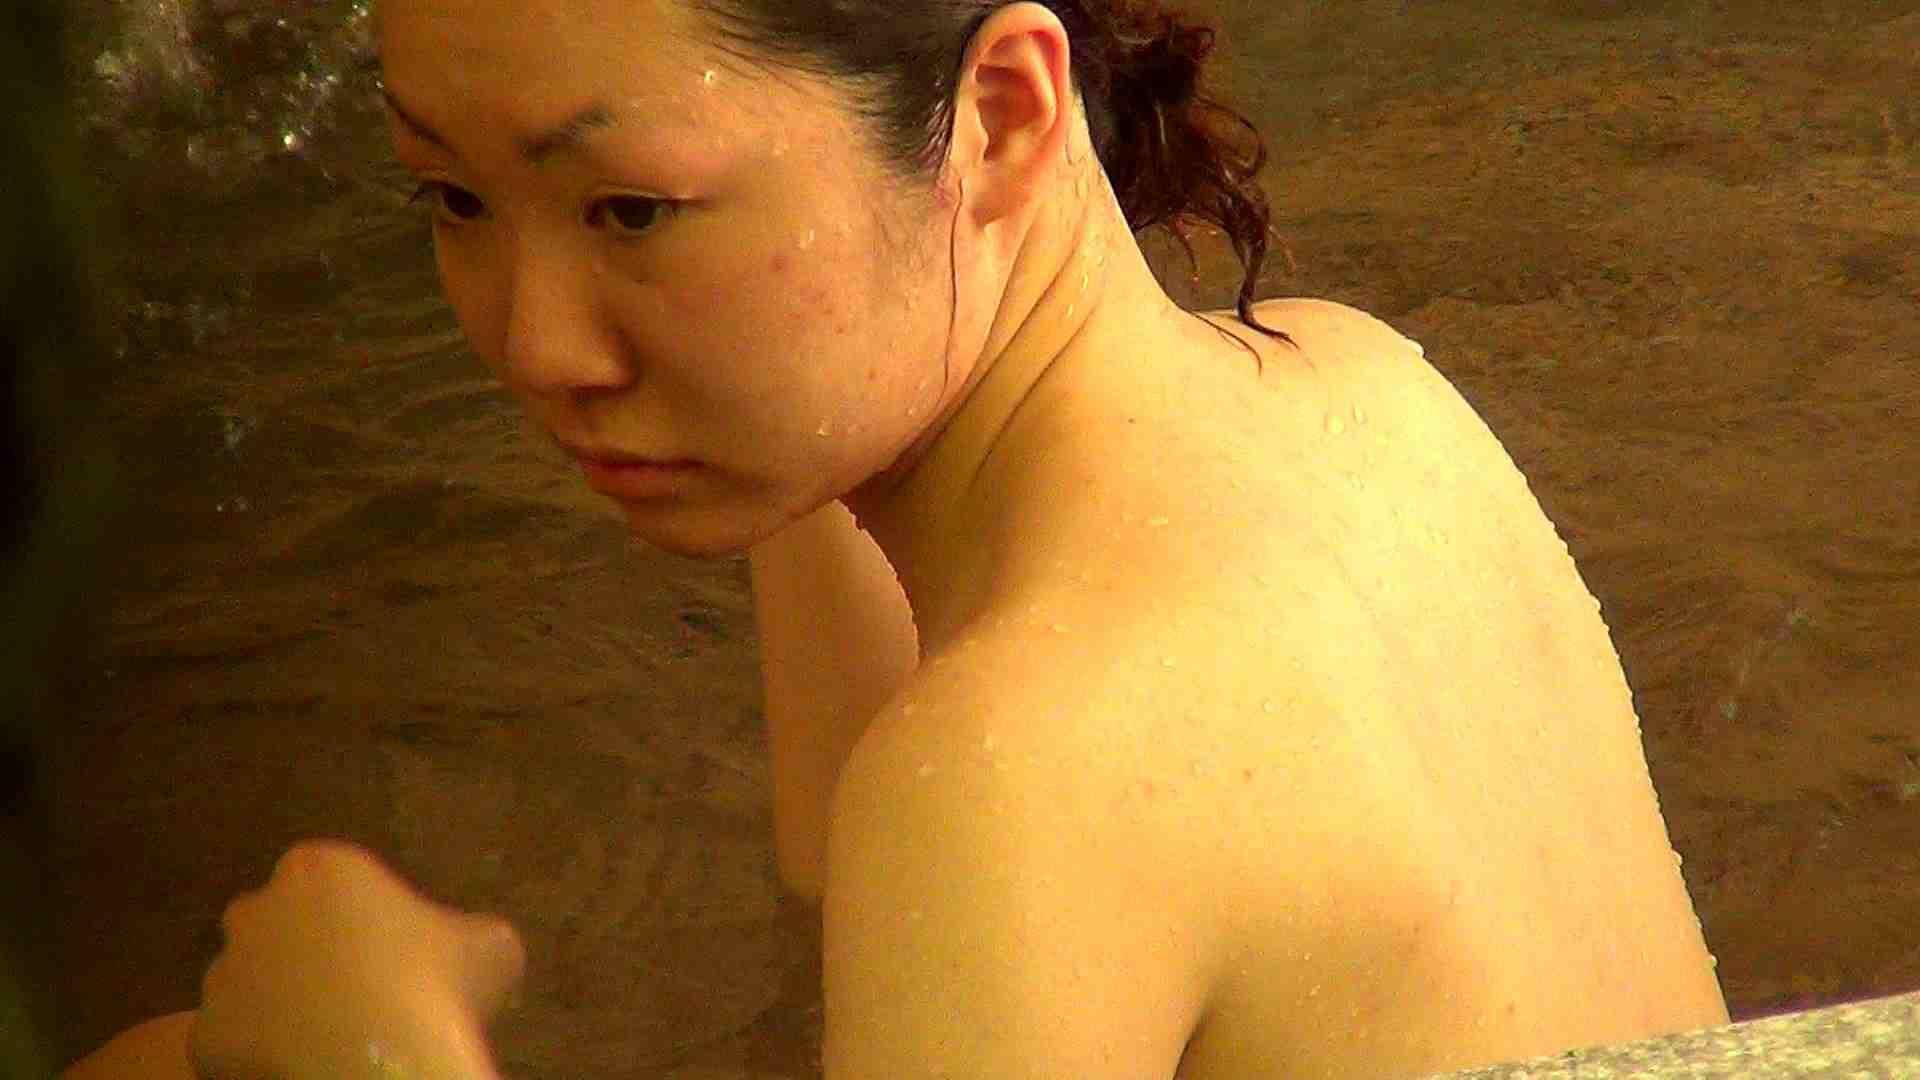 Aquaな露天風呂Vol.268 露天 隠し撮りオマンコ動画紹介 107画像 32